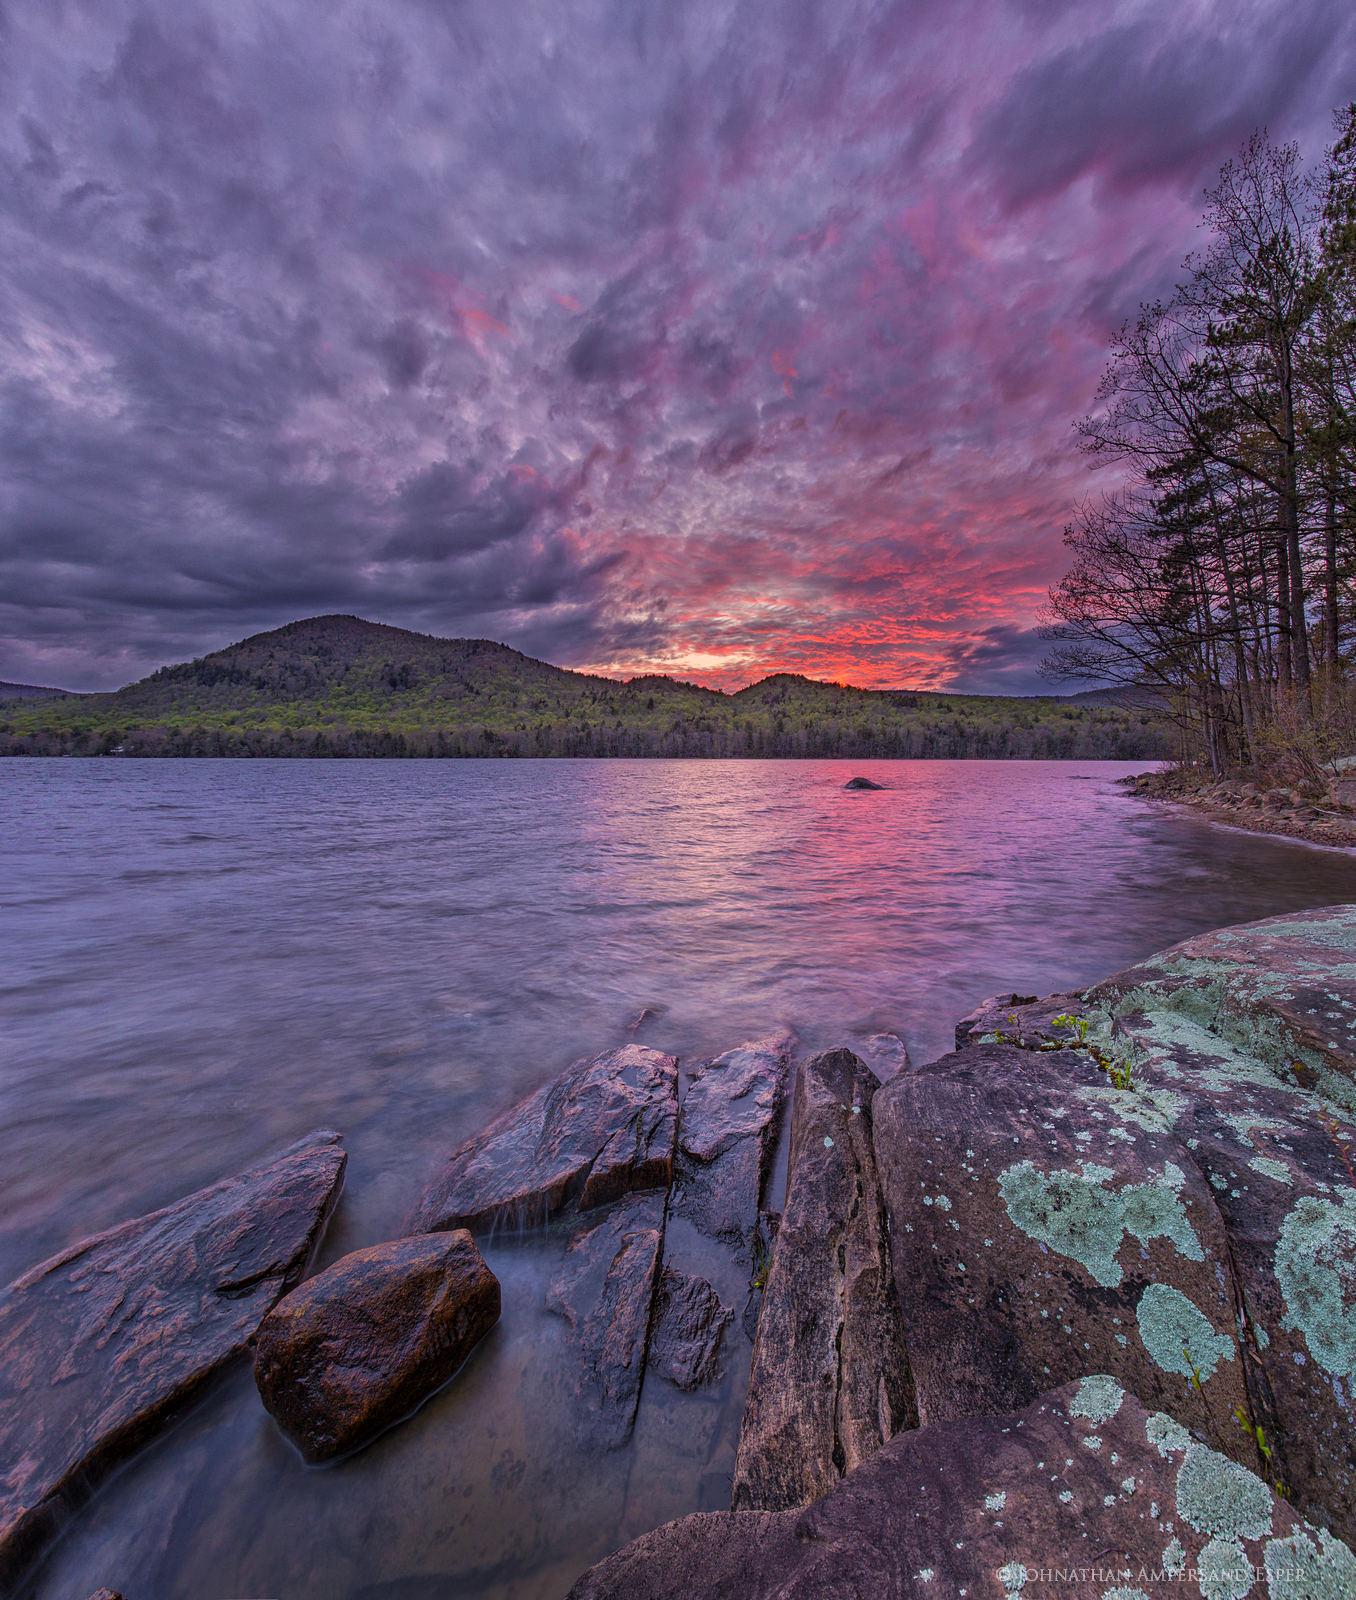 Piseco Lake,Piseco Mt,Pieseco Mountain,sunset,Piseco,Adirondack Park,lake,spring,2016, photo